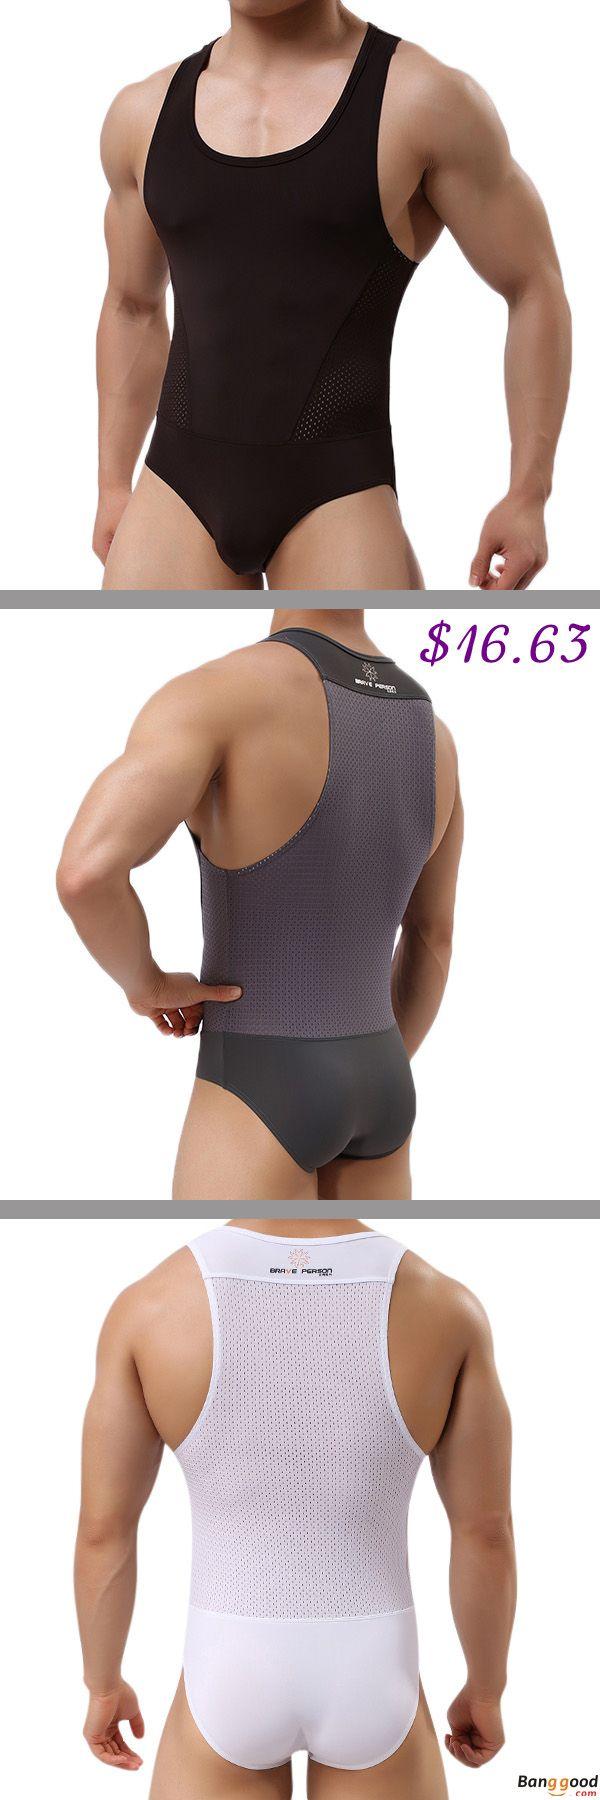 US$16.63 + Free Shipping. Men's Sexy Bodysuit Wrestling Onesie Transparent Mesh Lingerie Wrestling Leotard Hot Bodysuit. Color: White, Gray, Black, Coffee. Onepiece Sexy Underwear.